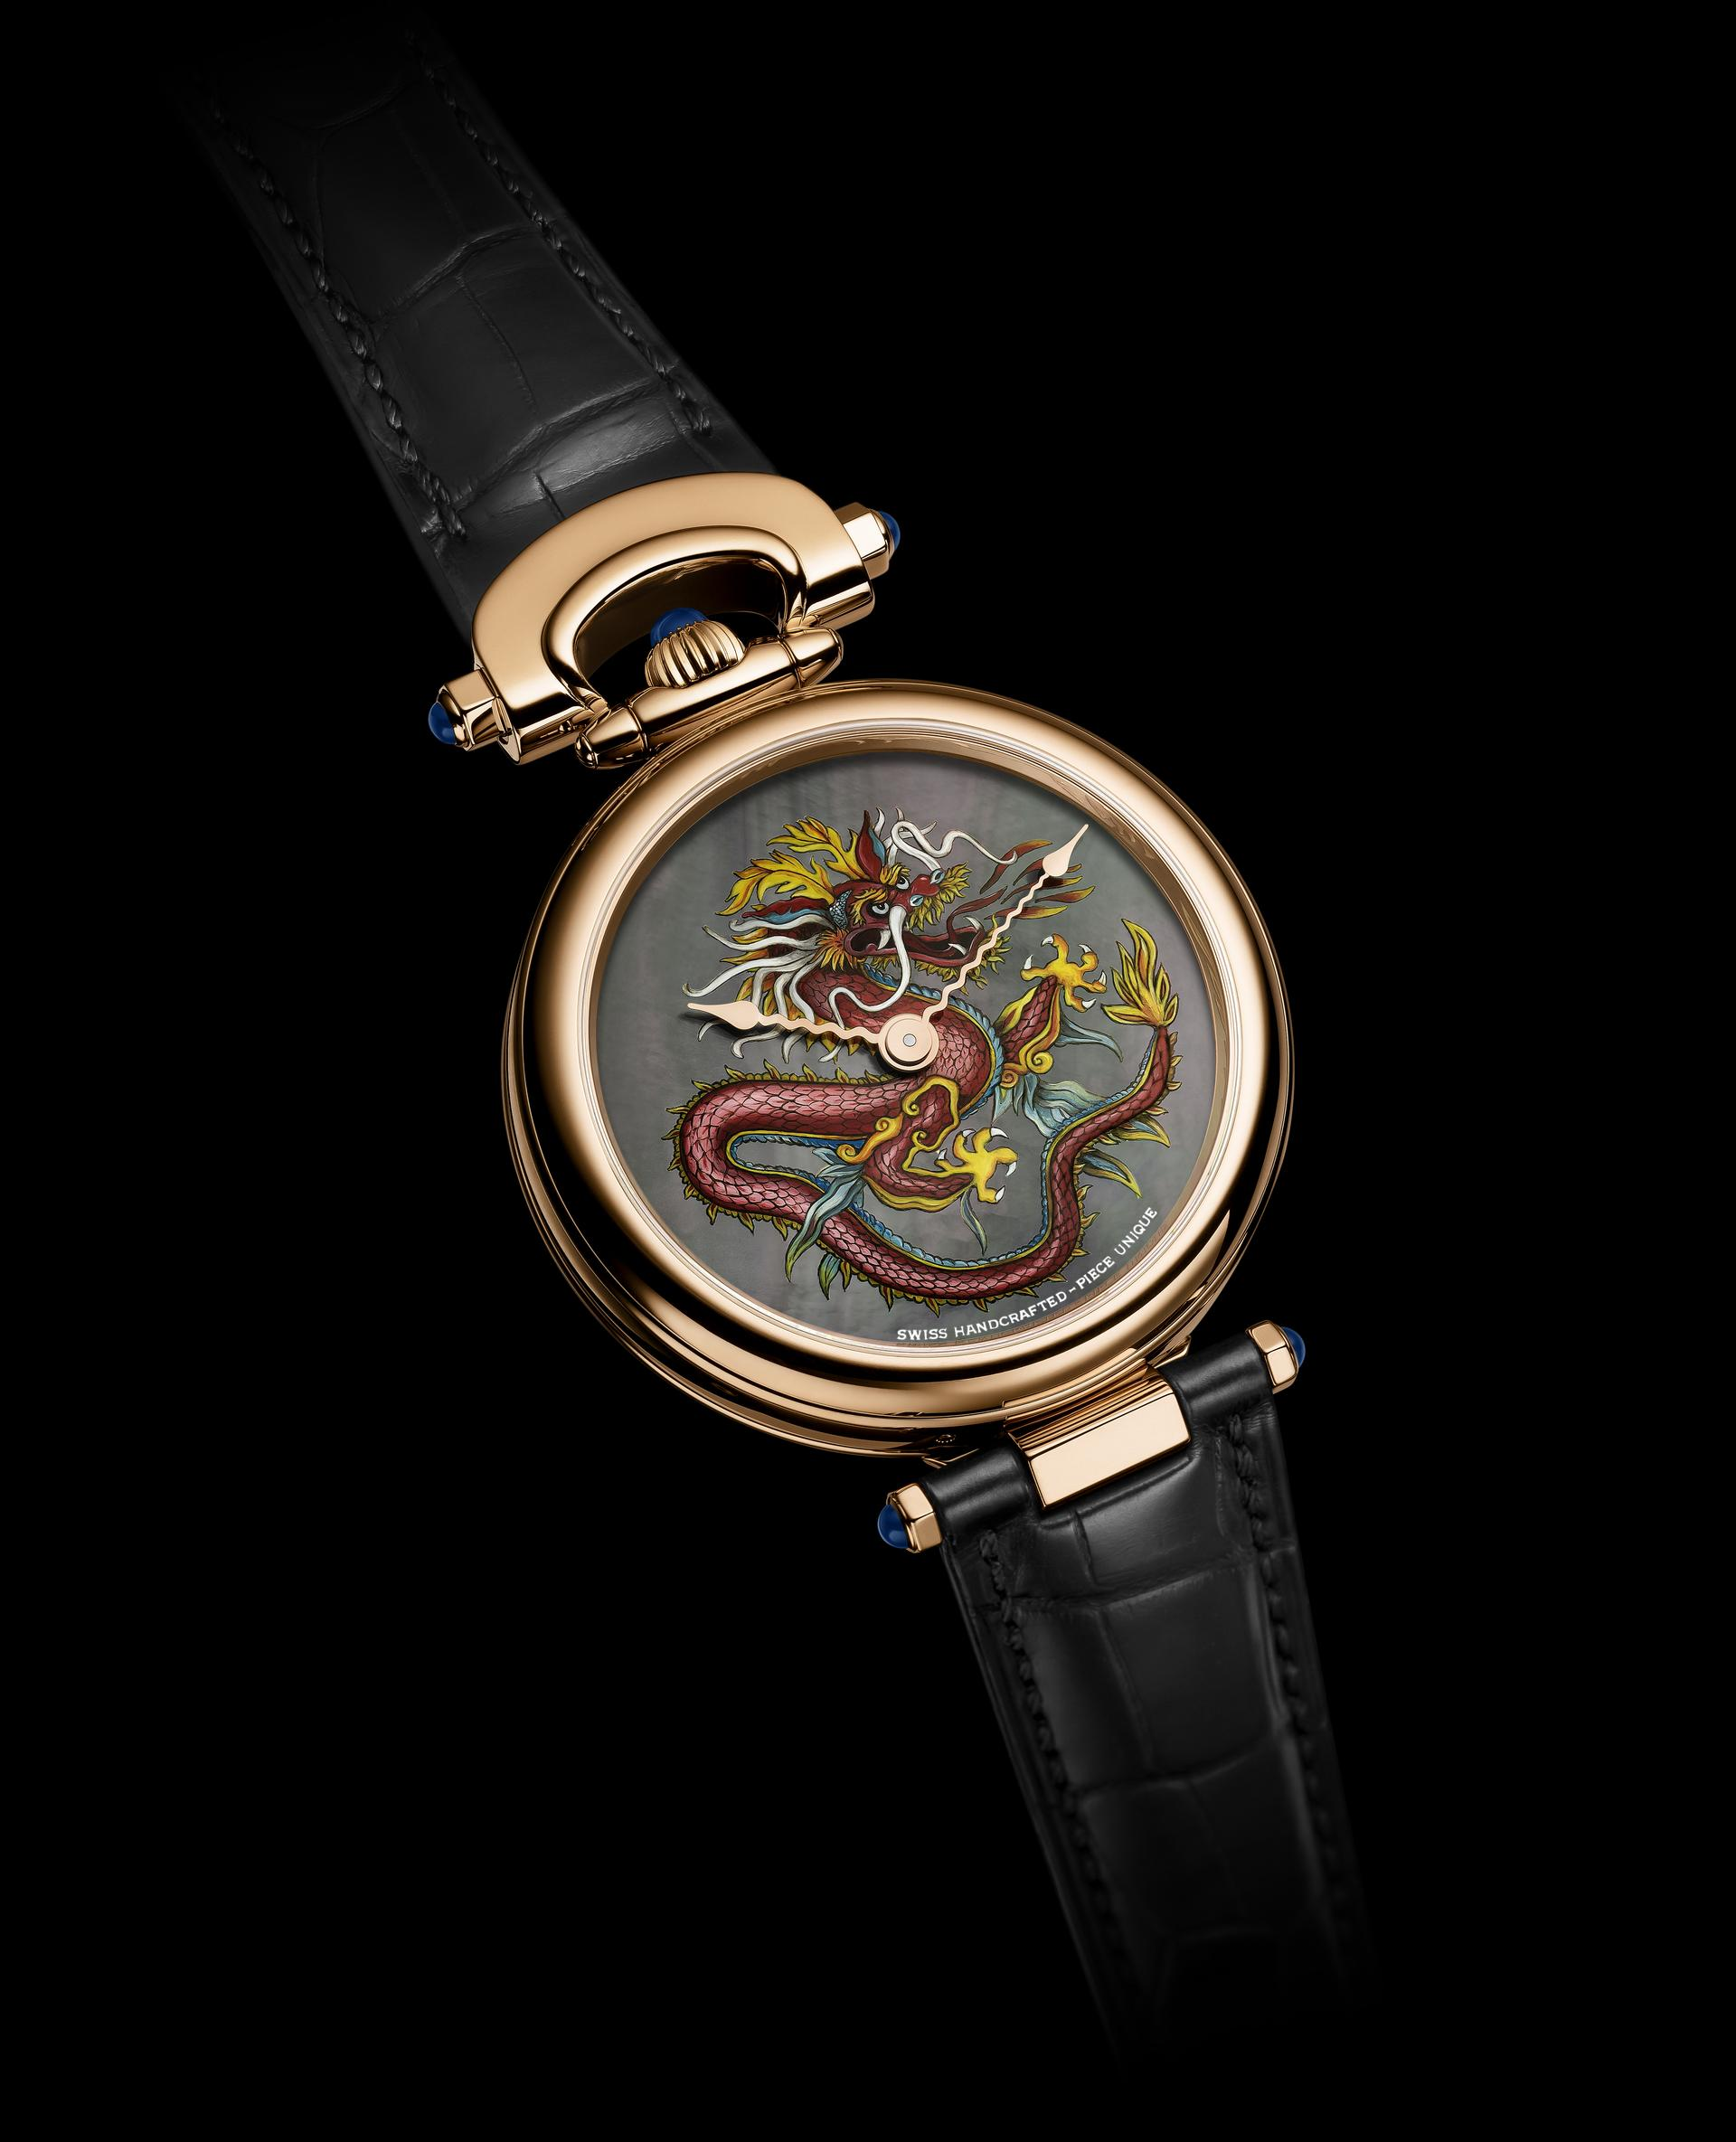 Bovet 1822 Amadéo Fleurier Chinese Dragon